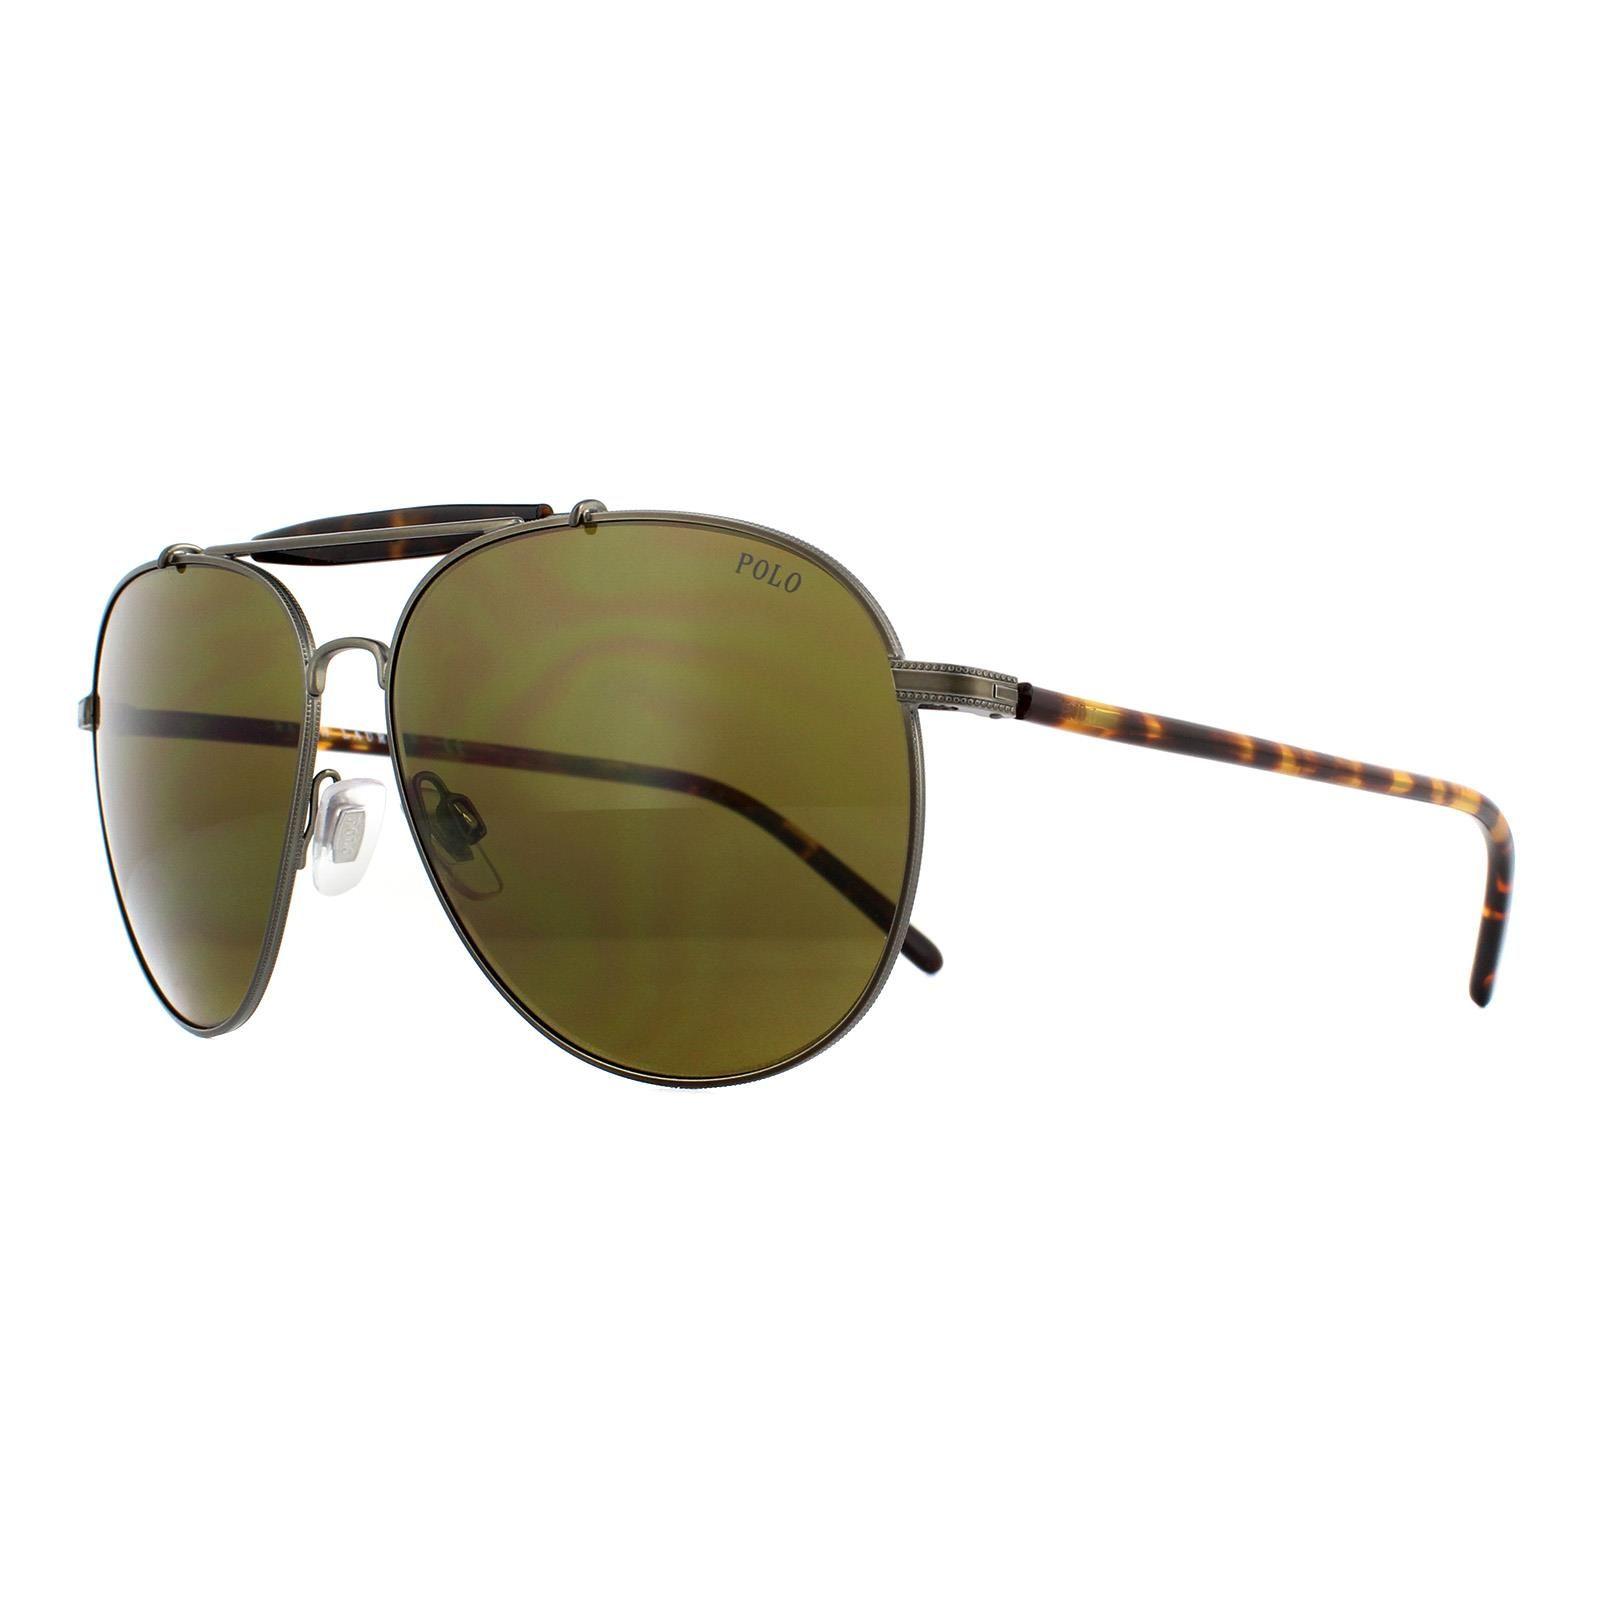 Polo Ralph Lauren Sunglasses 3106 932773 Aged Bronze Olive